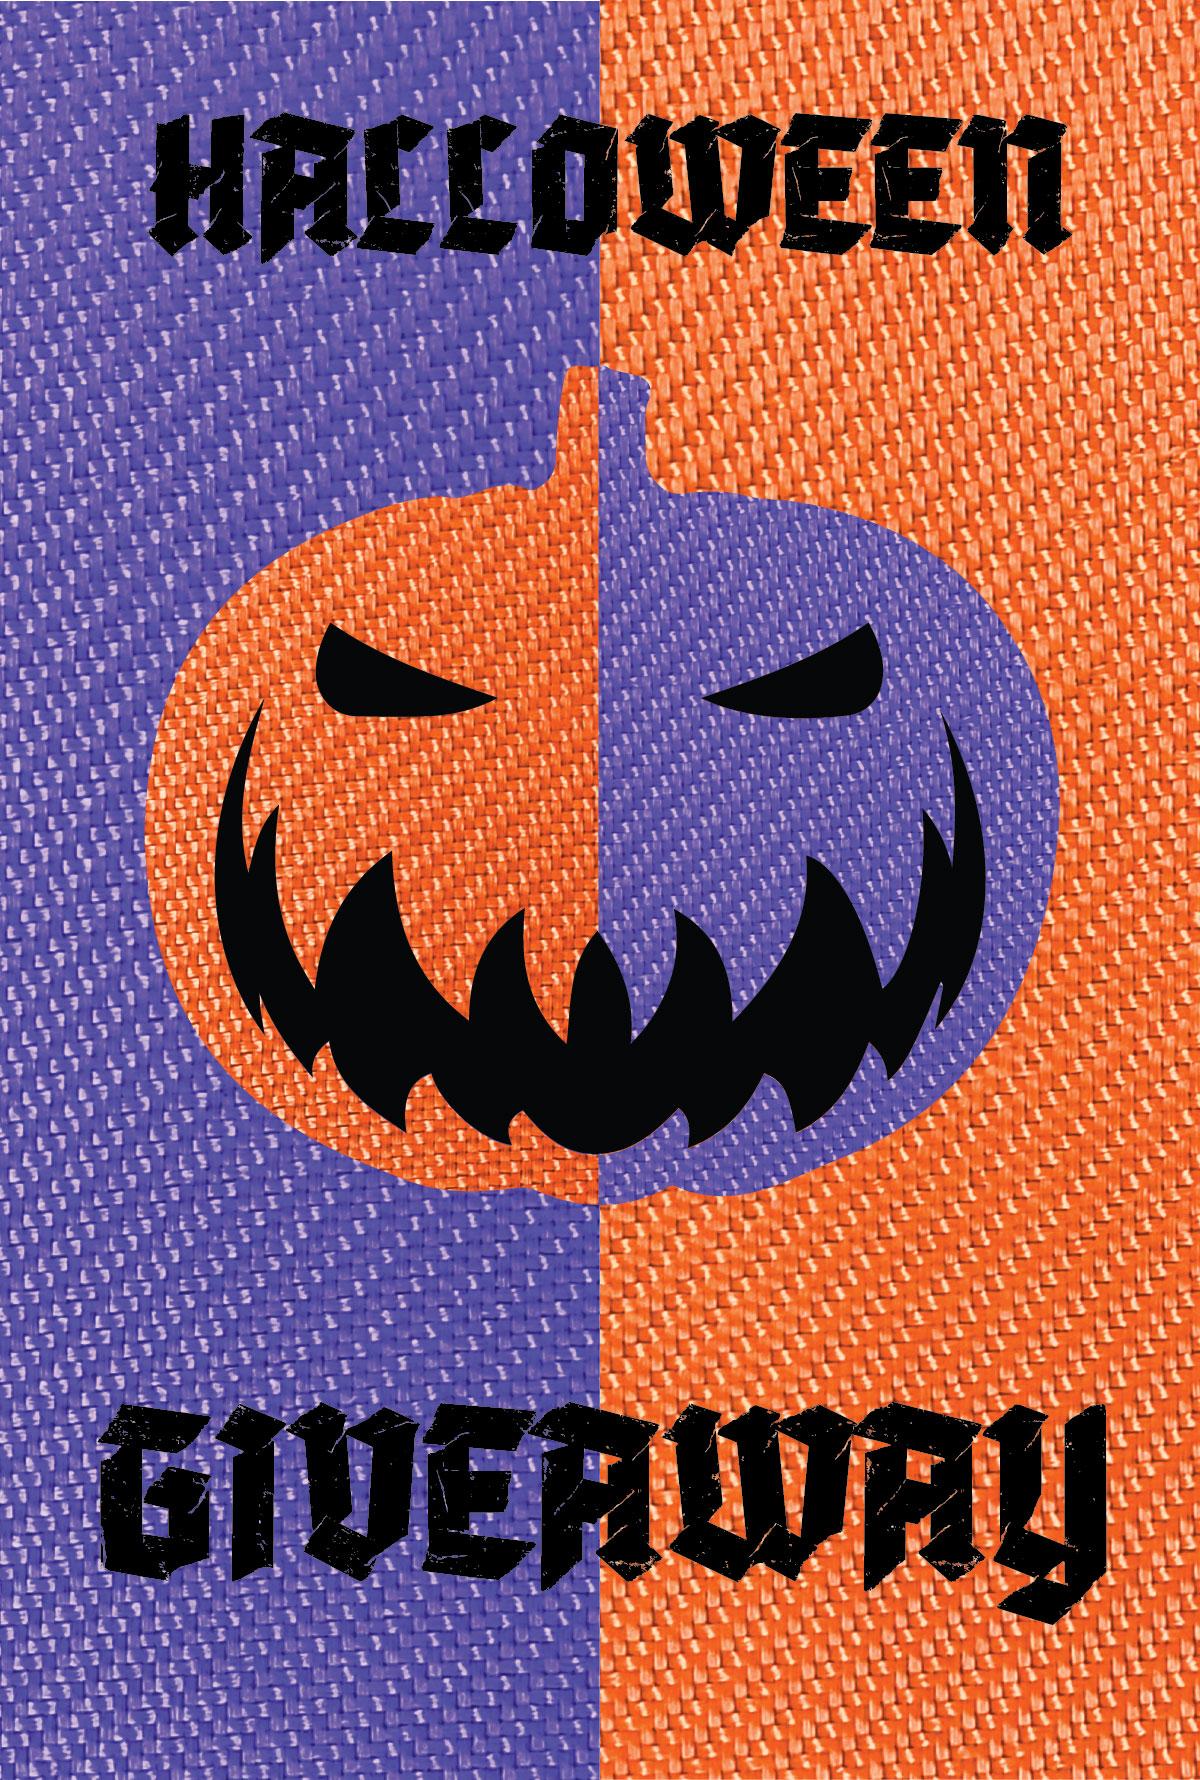 Carbon Fiber Pumpkin Candy Bowl! Halloween Giveaway Giveaway Image